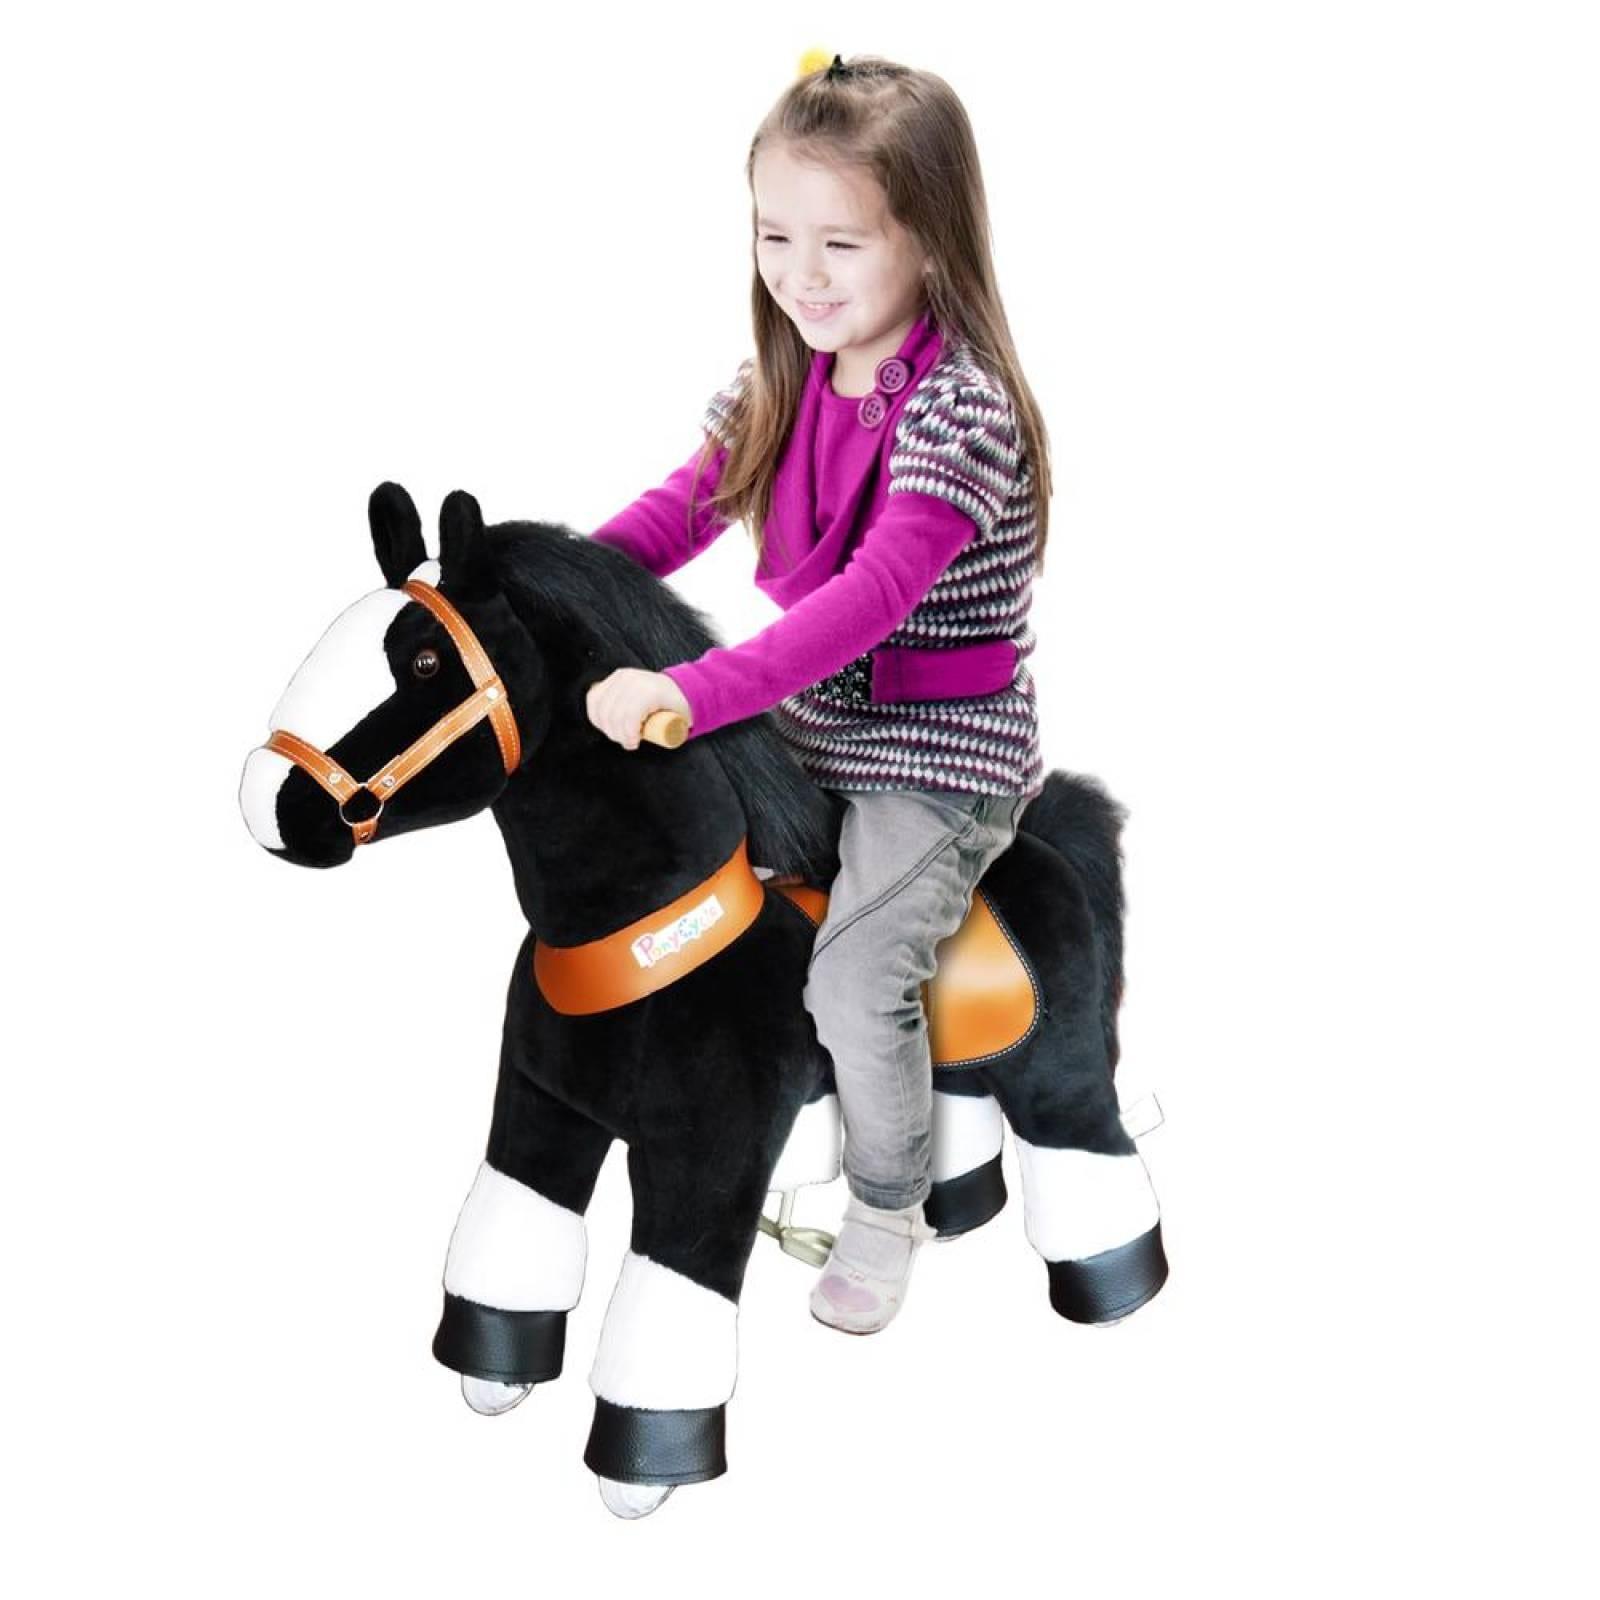 Caballito Montable De Empuje Pony Cycle Con Ruedas Juego Para Niños Negro